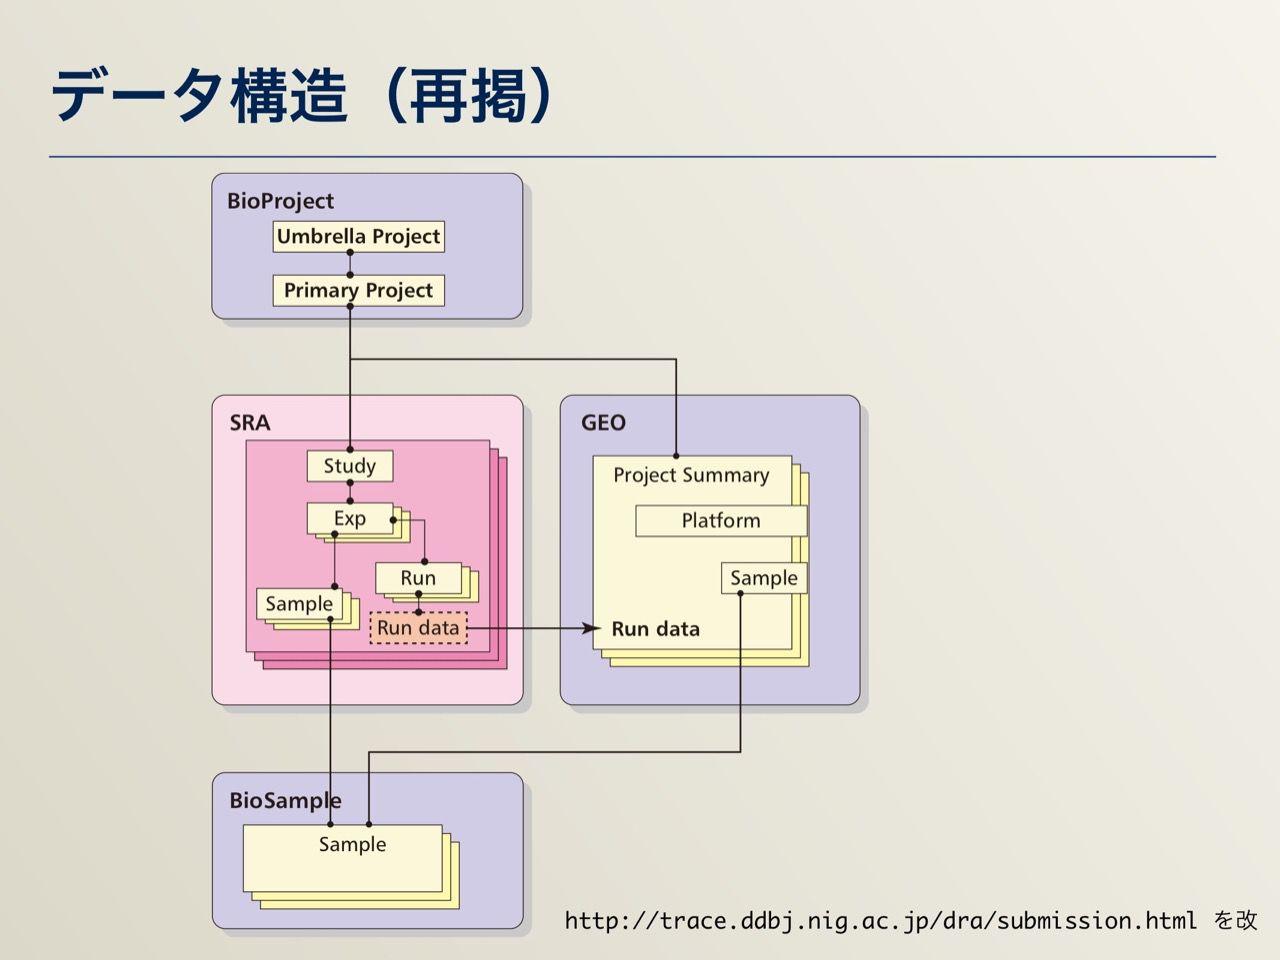 images/AJACS64_03_nakazato_038.jpg